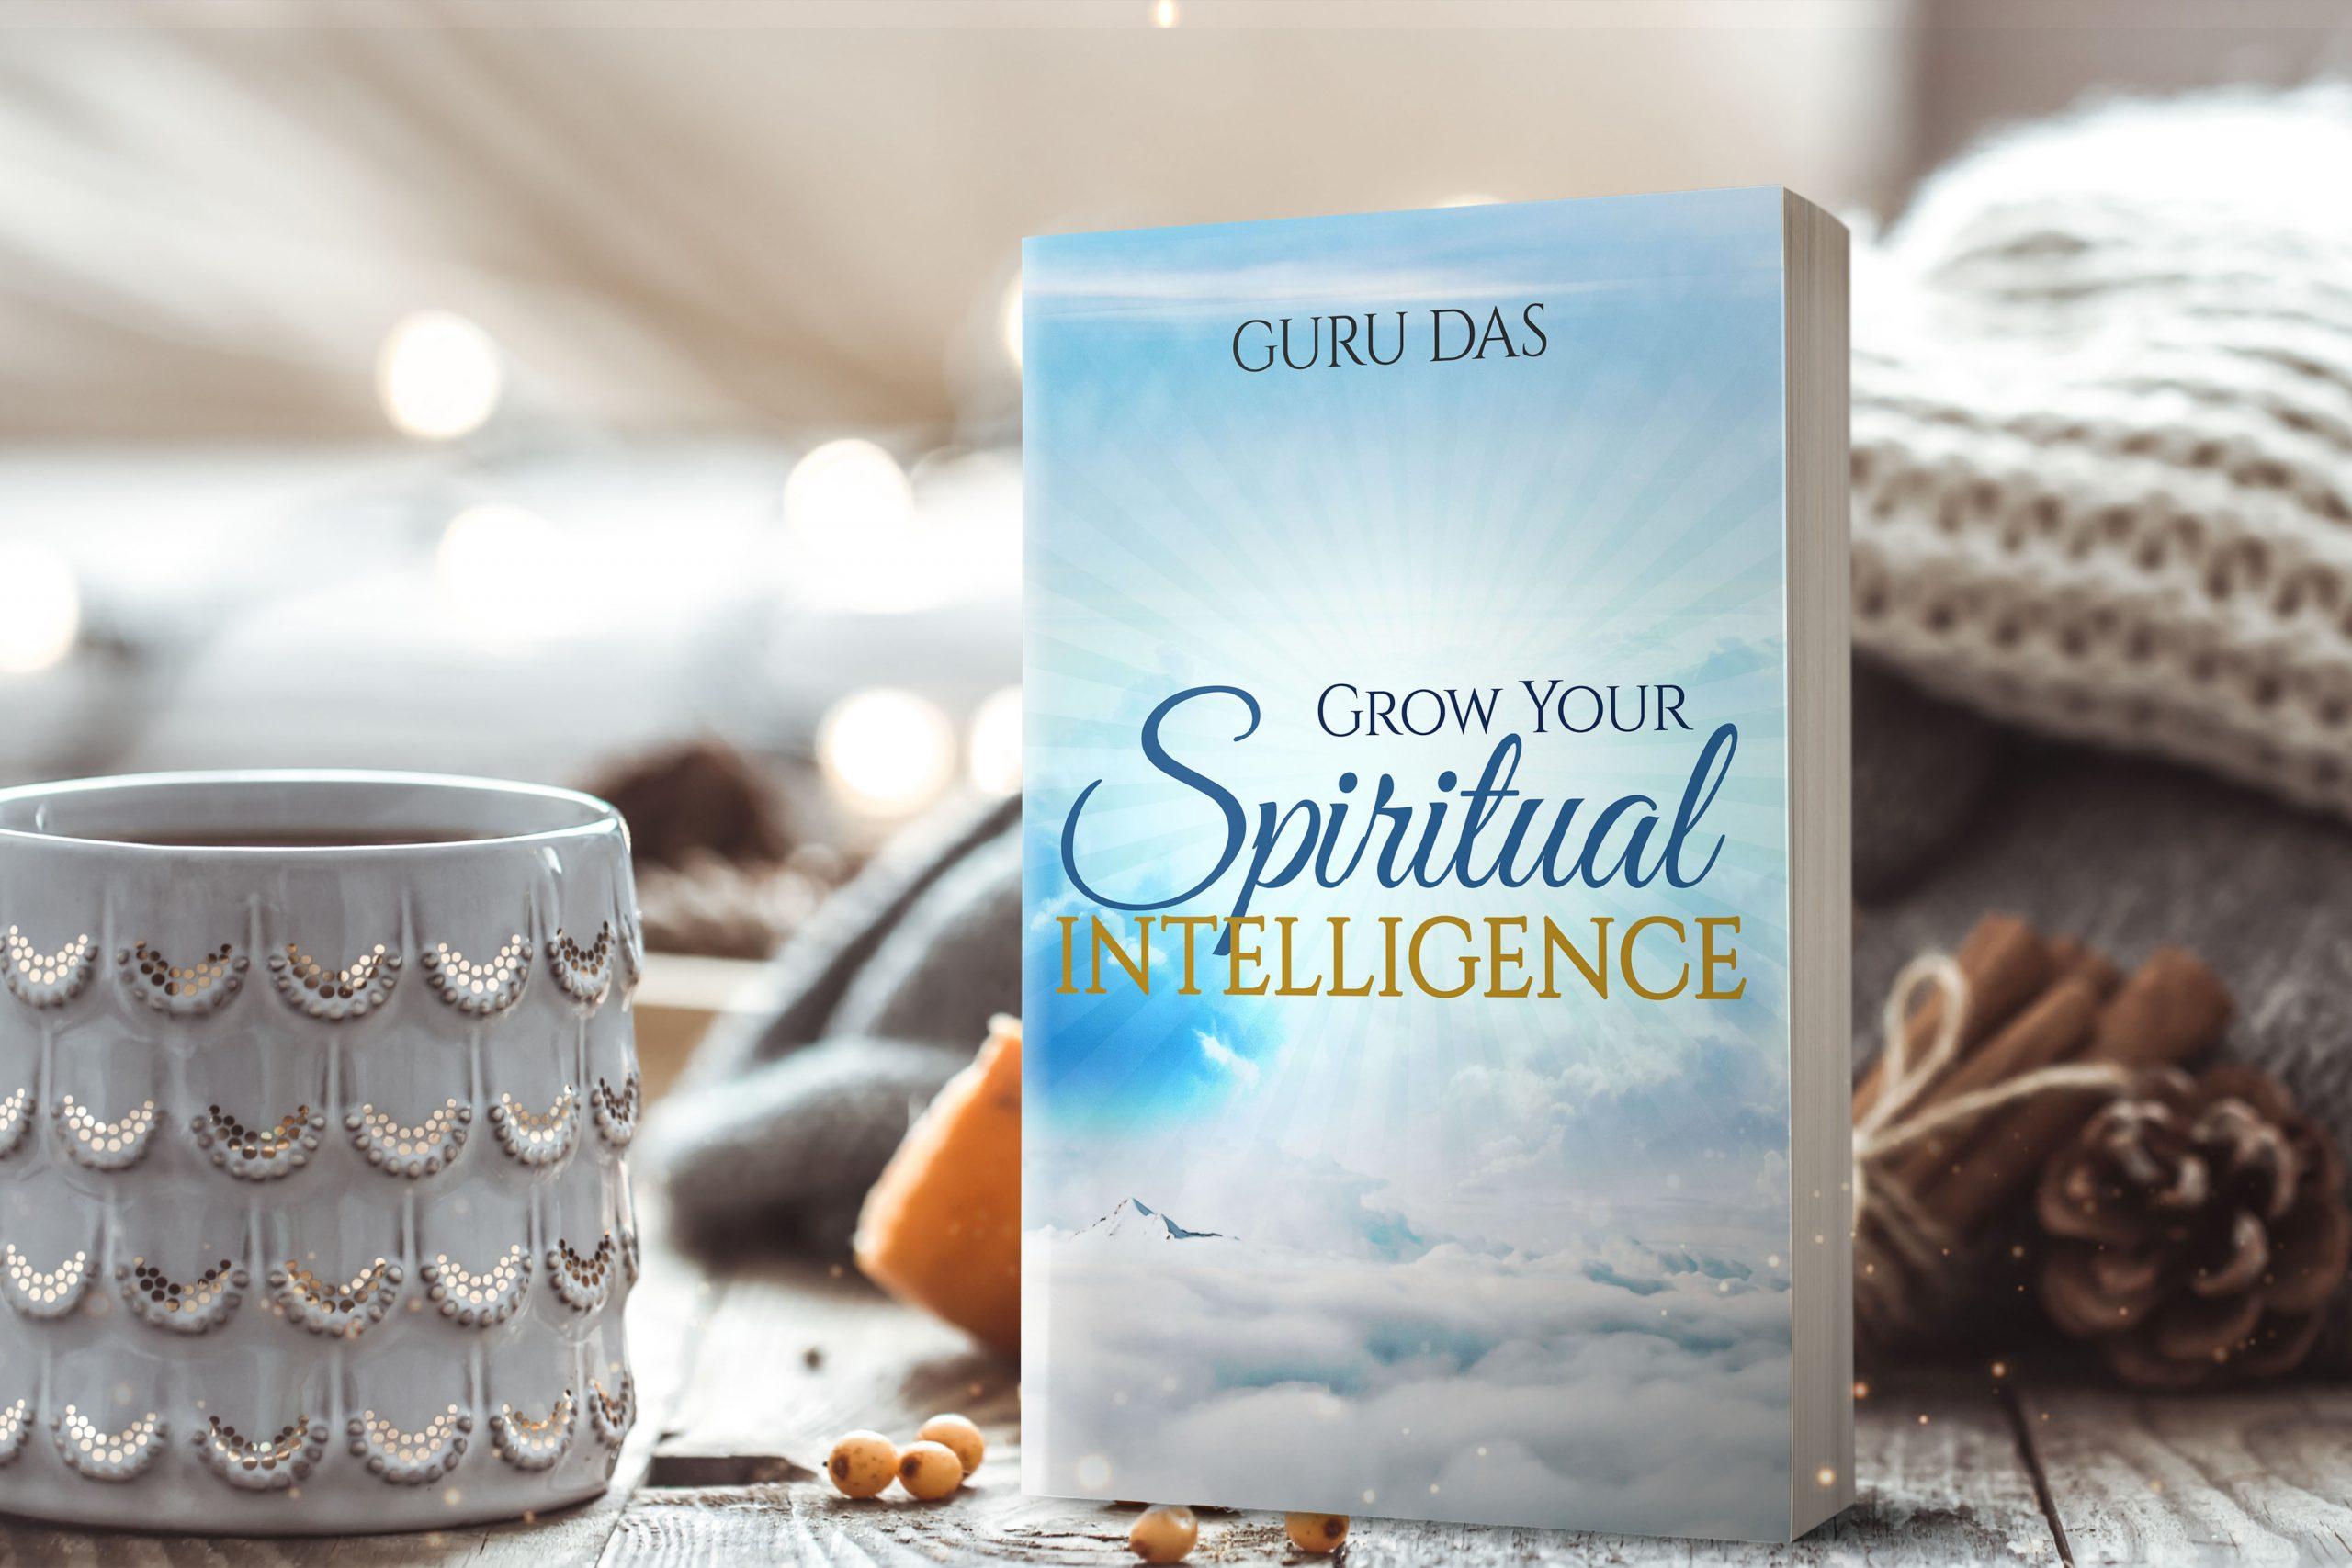 Grow Your Spiritual Intelligence by Guru Das